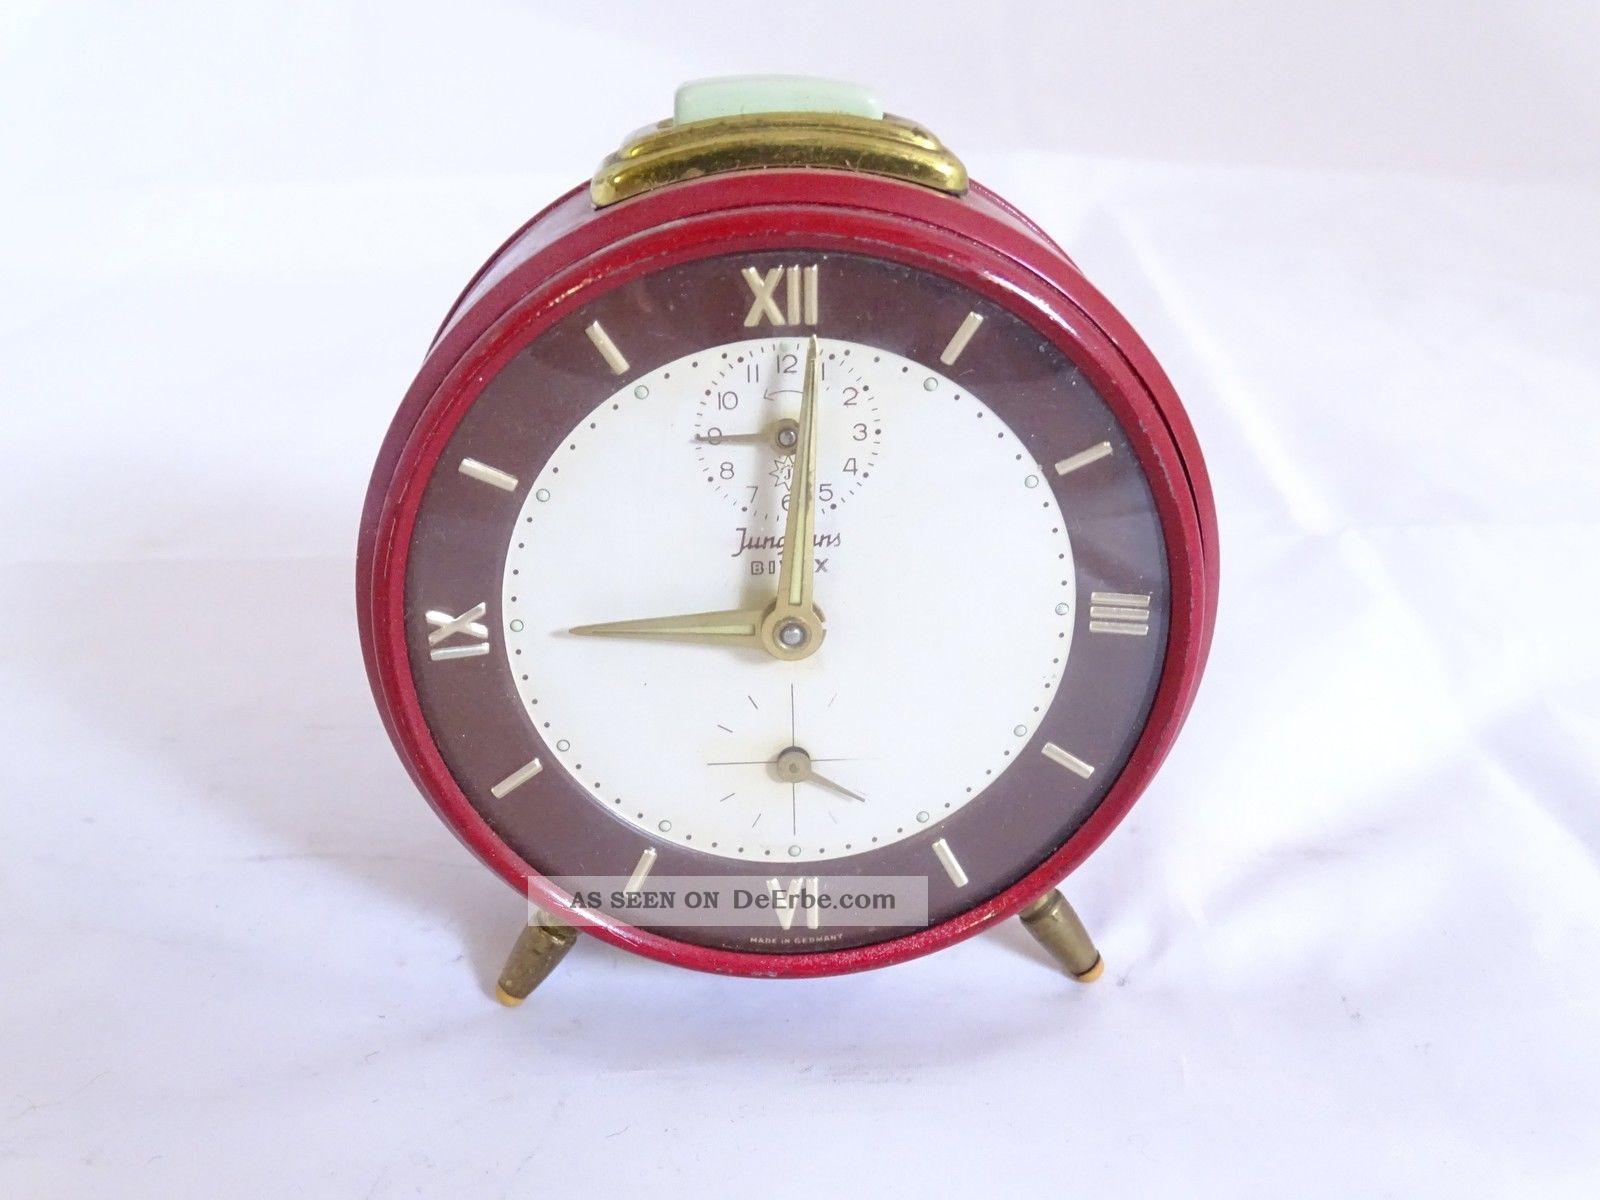 Junghans Bifox Mid Century Wecker In Rot Extra Sekunde Volle Funktion 1960-1969 Bild